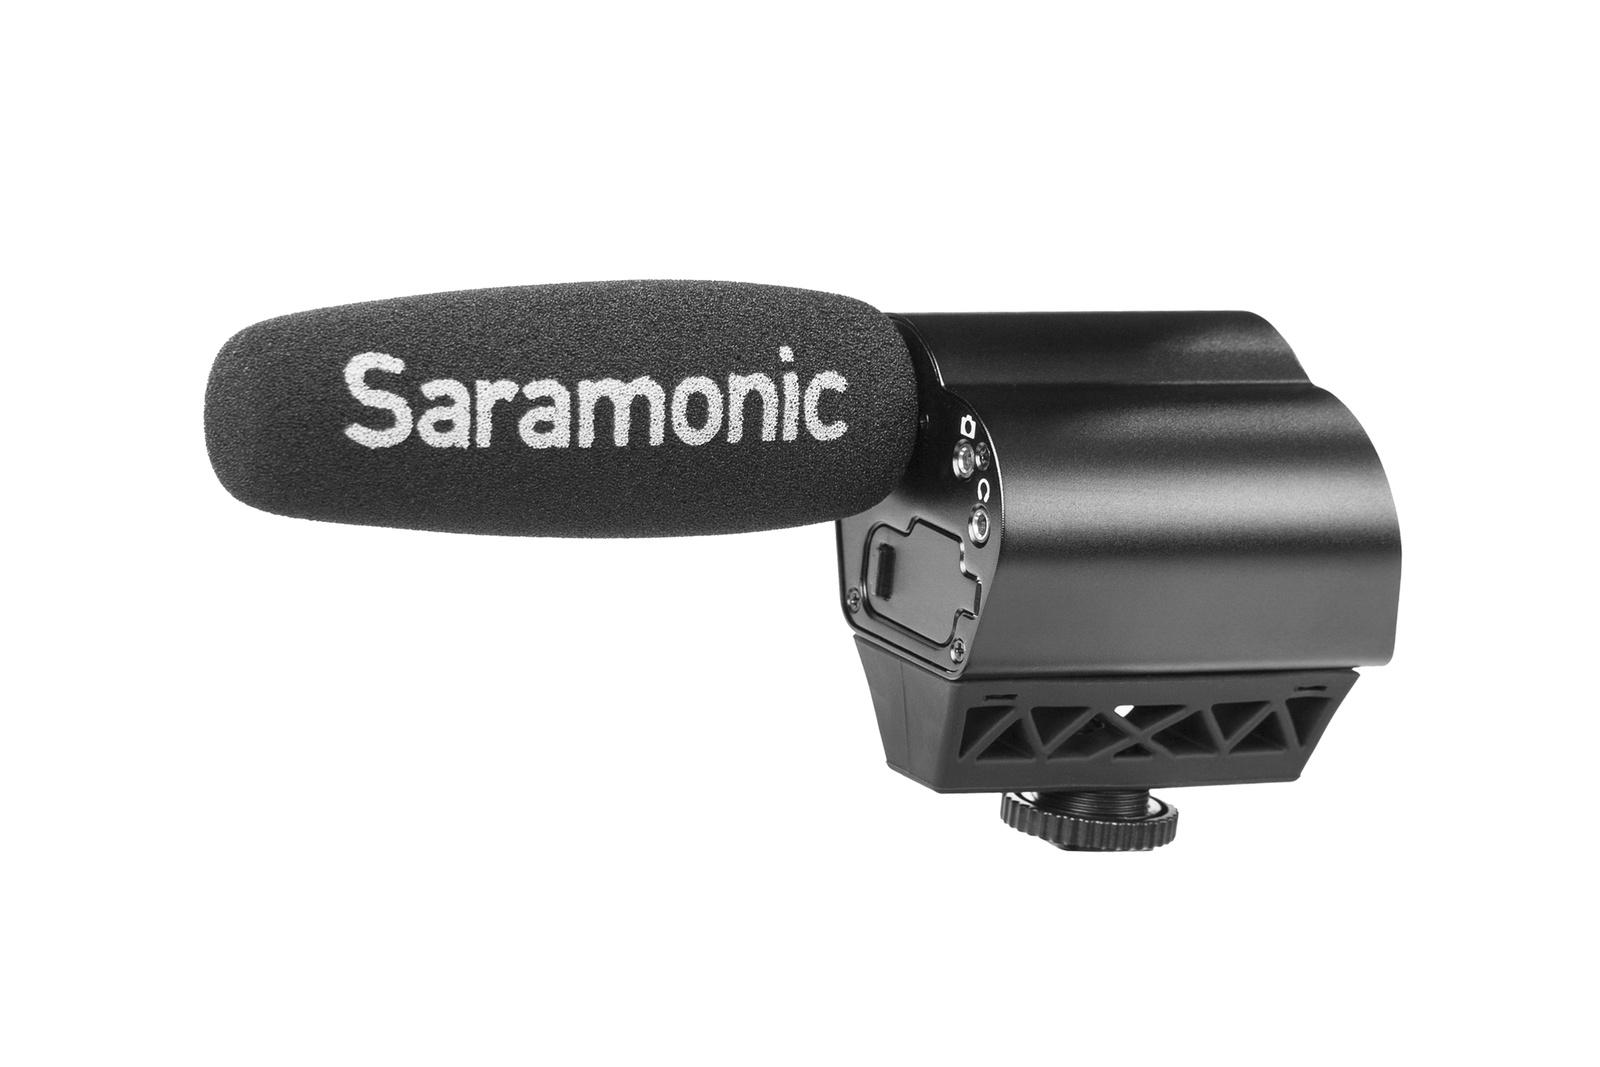 лучшая цена Микрофон Saramonic Vmic Recorder